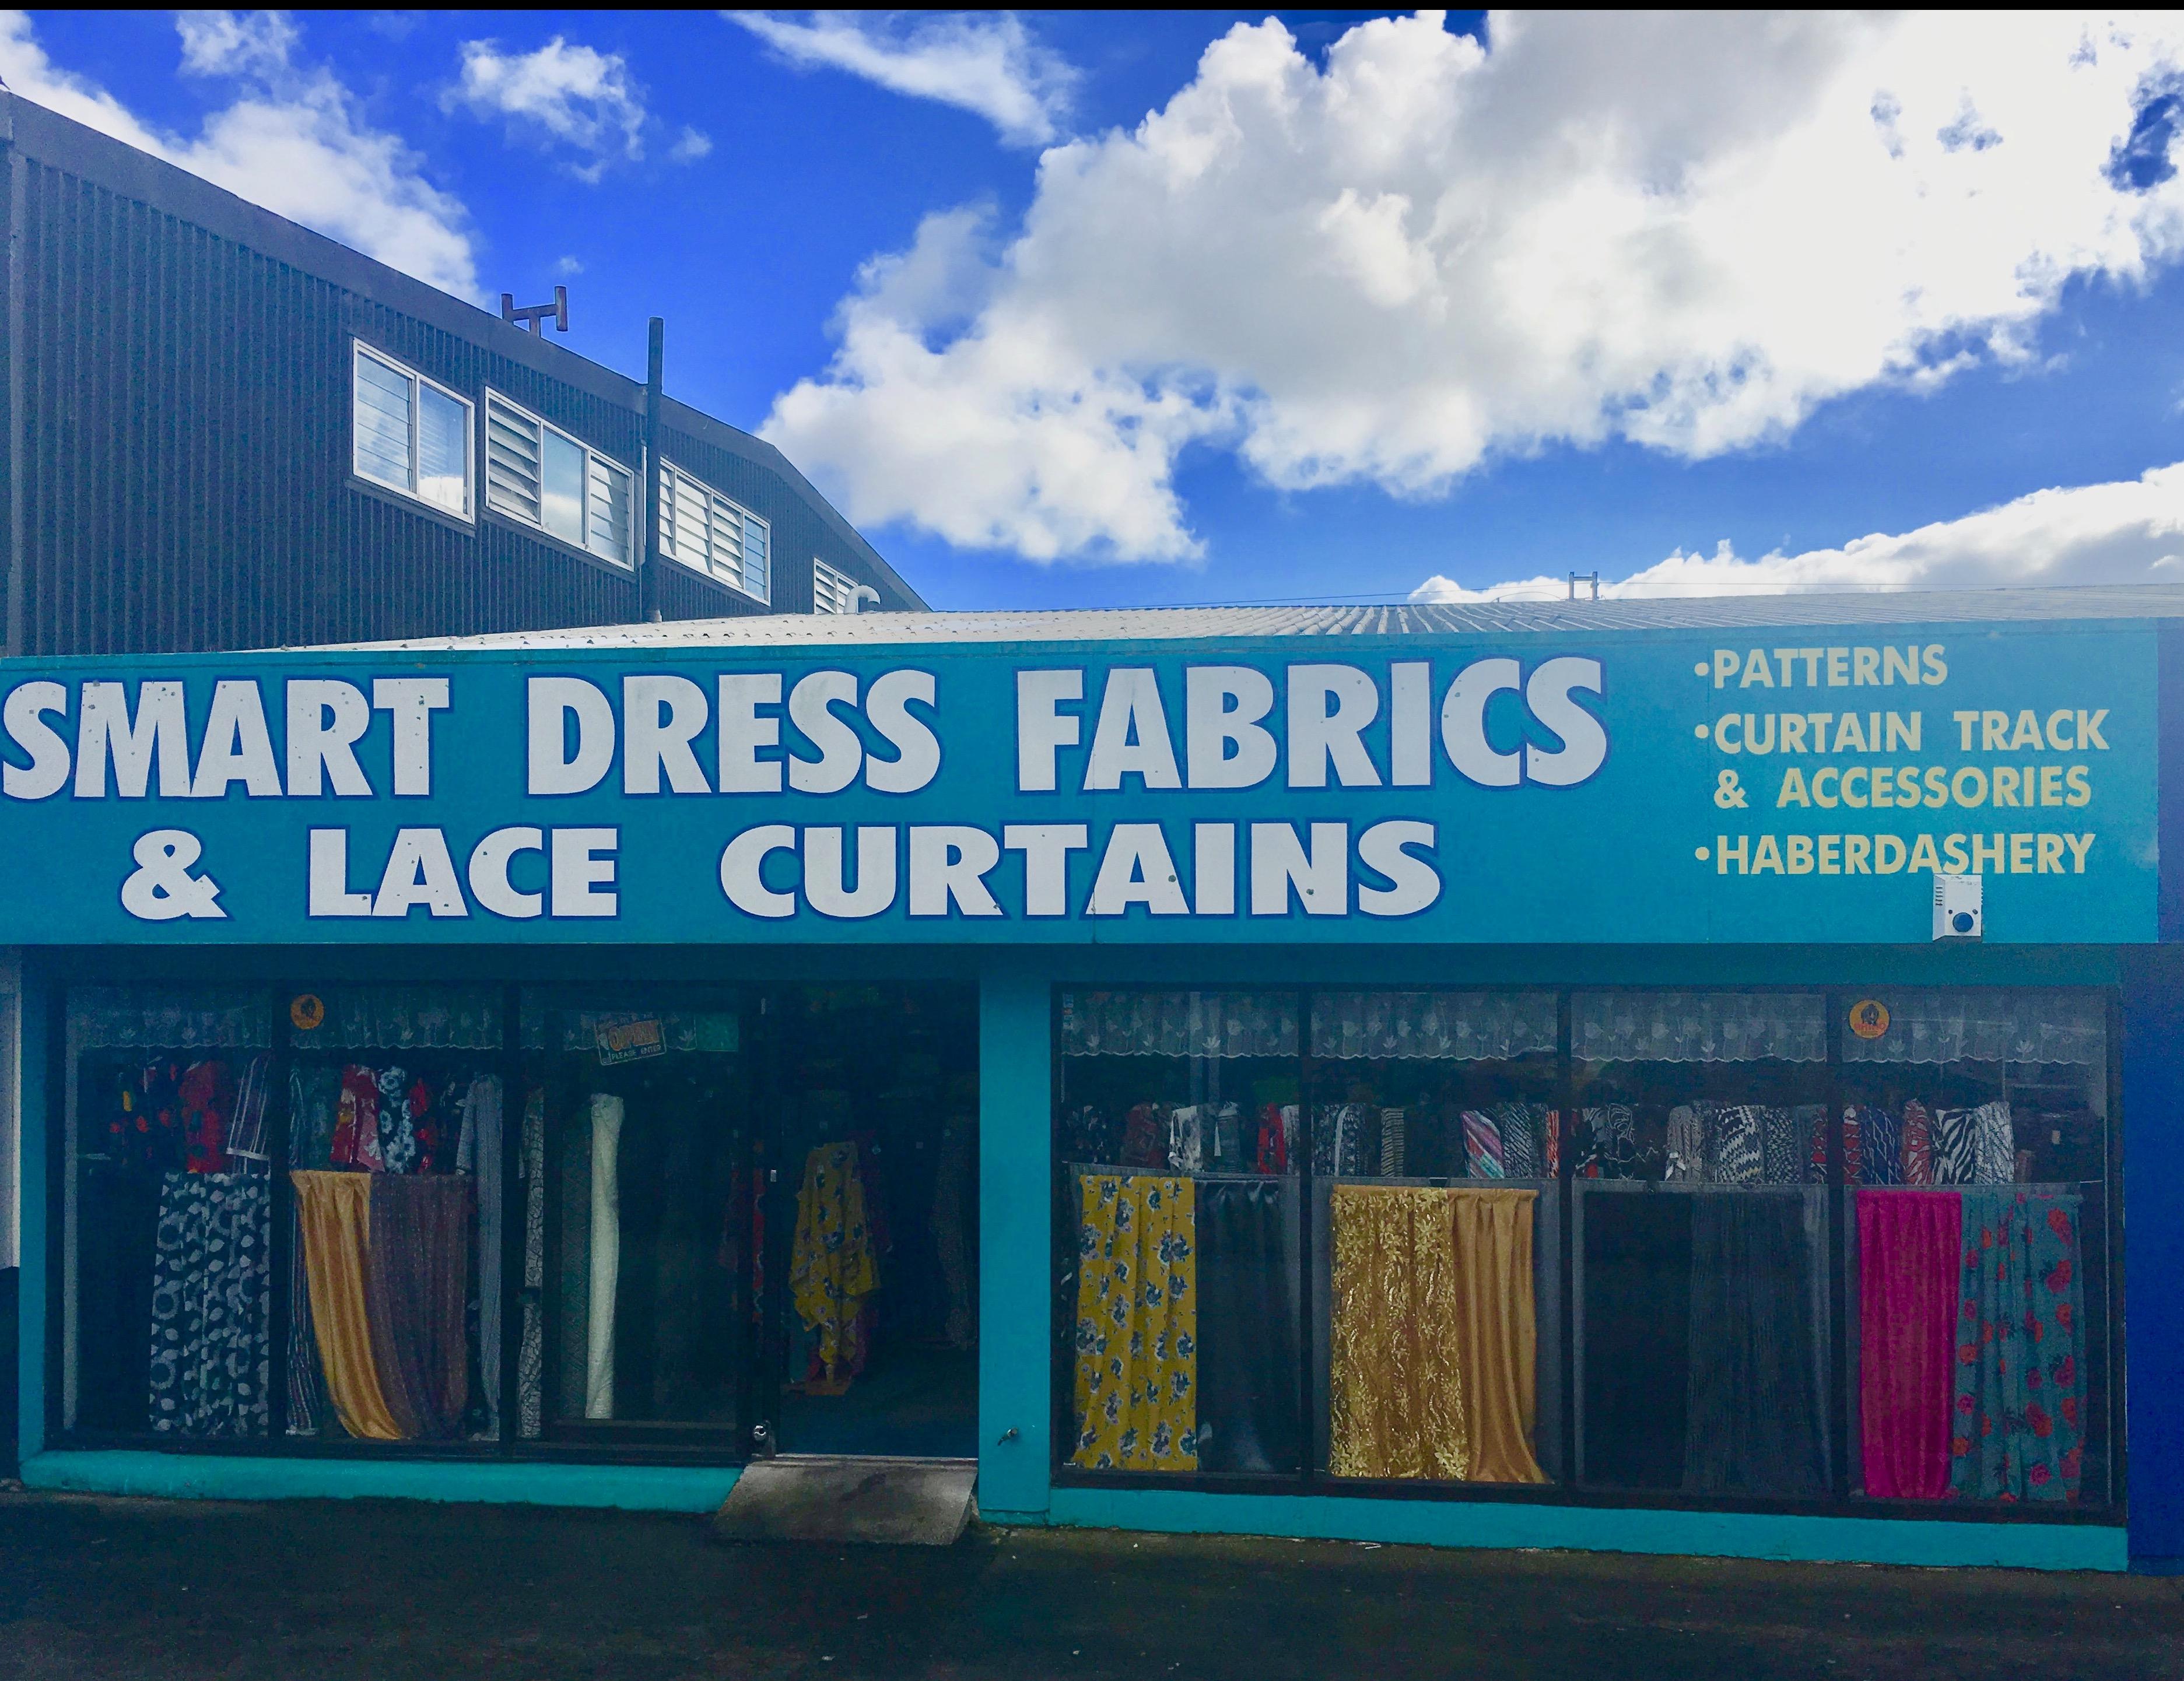 Smart Dress Fabrics